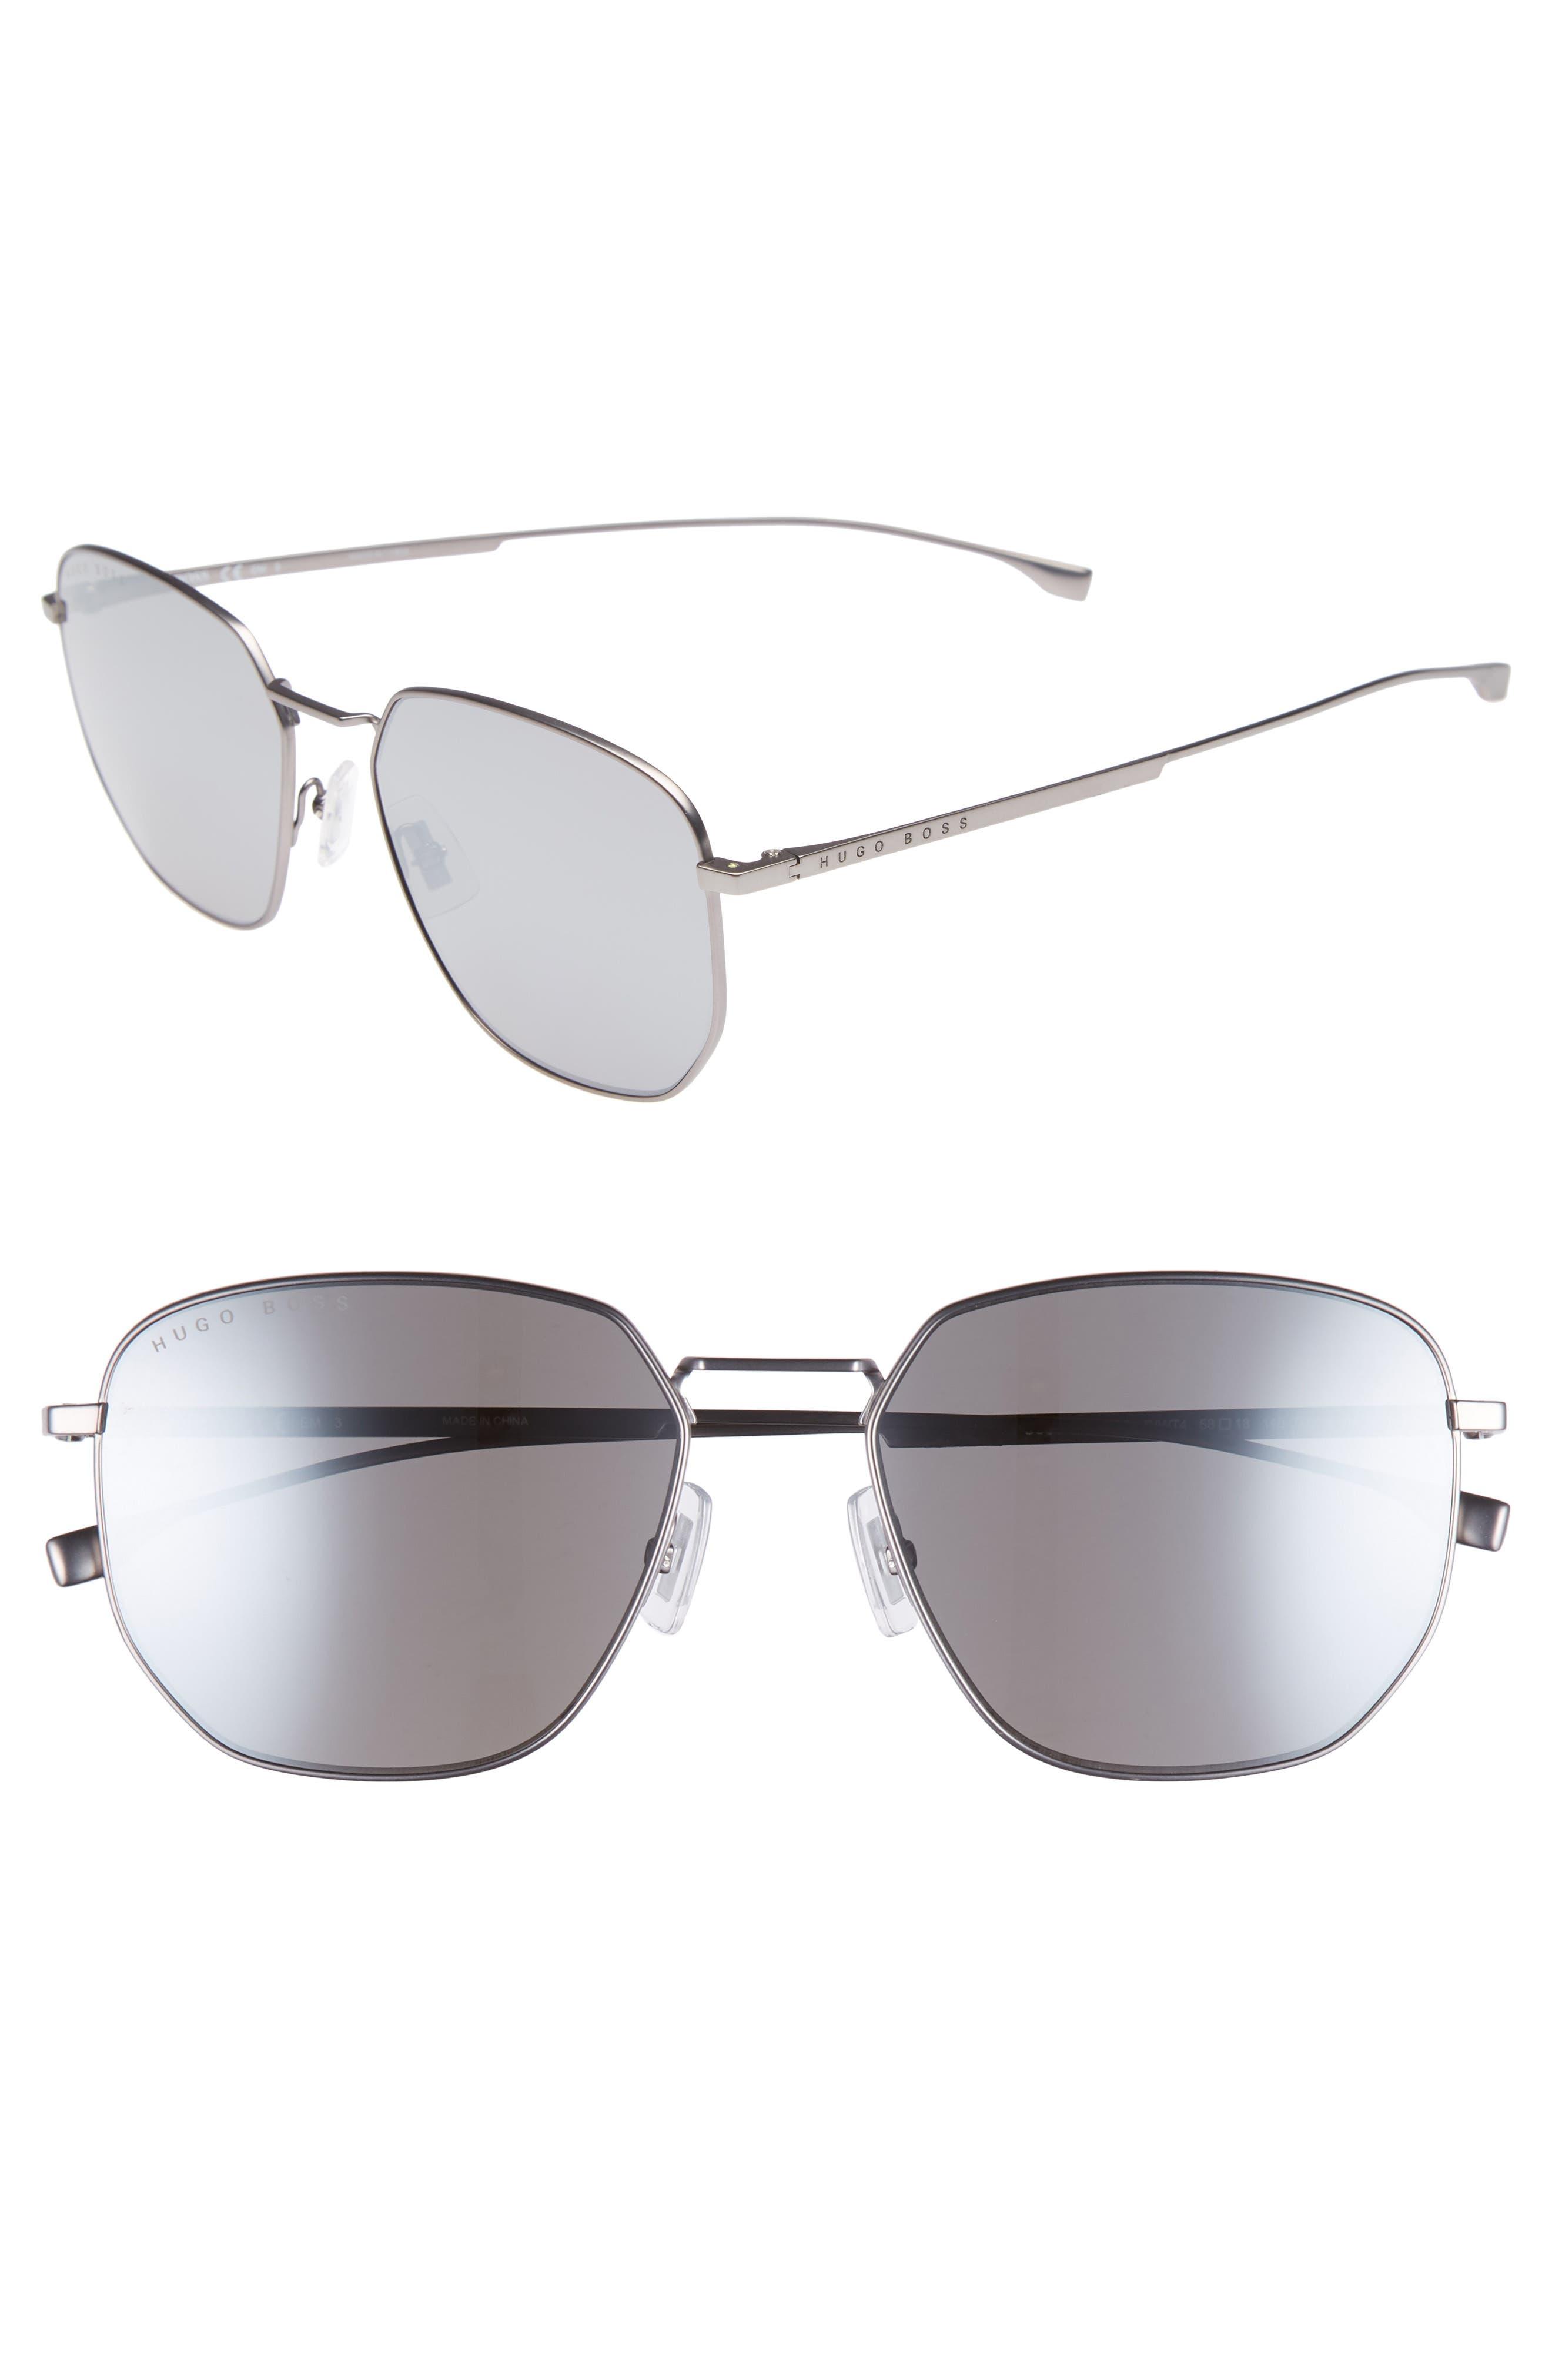 Special Fit 58mm Polarized Titanium Aviator Sunglasses,                             Main thumbnail 1, color,                             MATTE GREY